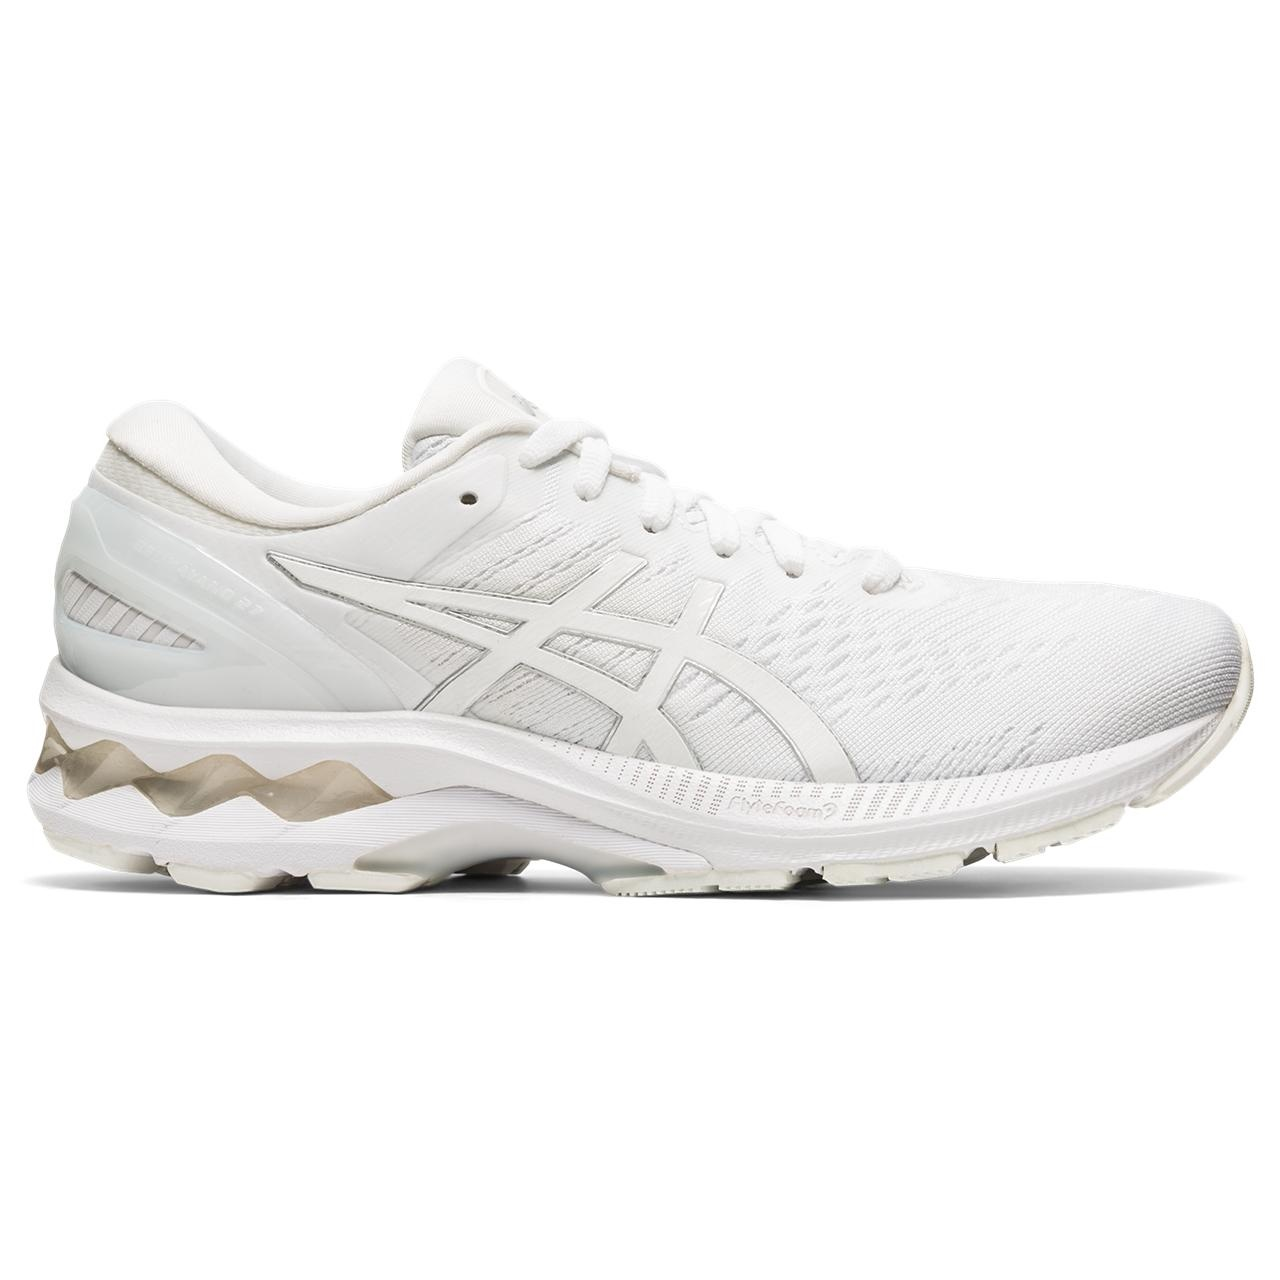 ASICS ASICS 1012A649 101 Gel Kayano 27 White White Women's Running Shoes (Size 8 US)